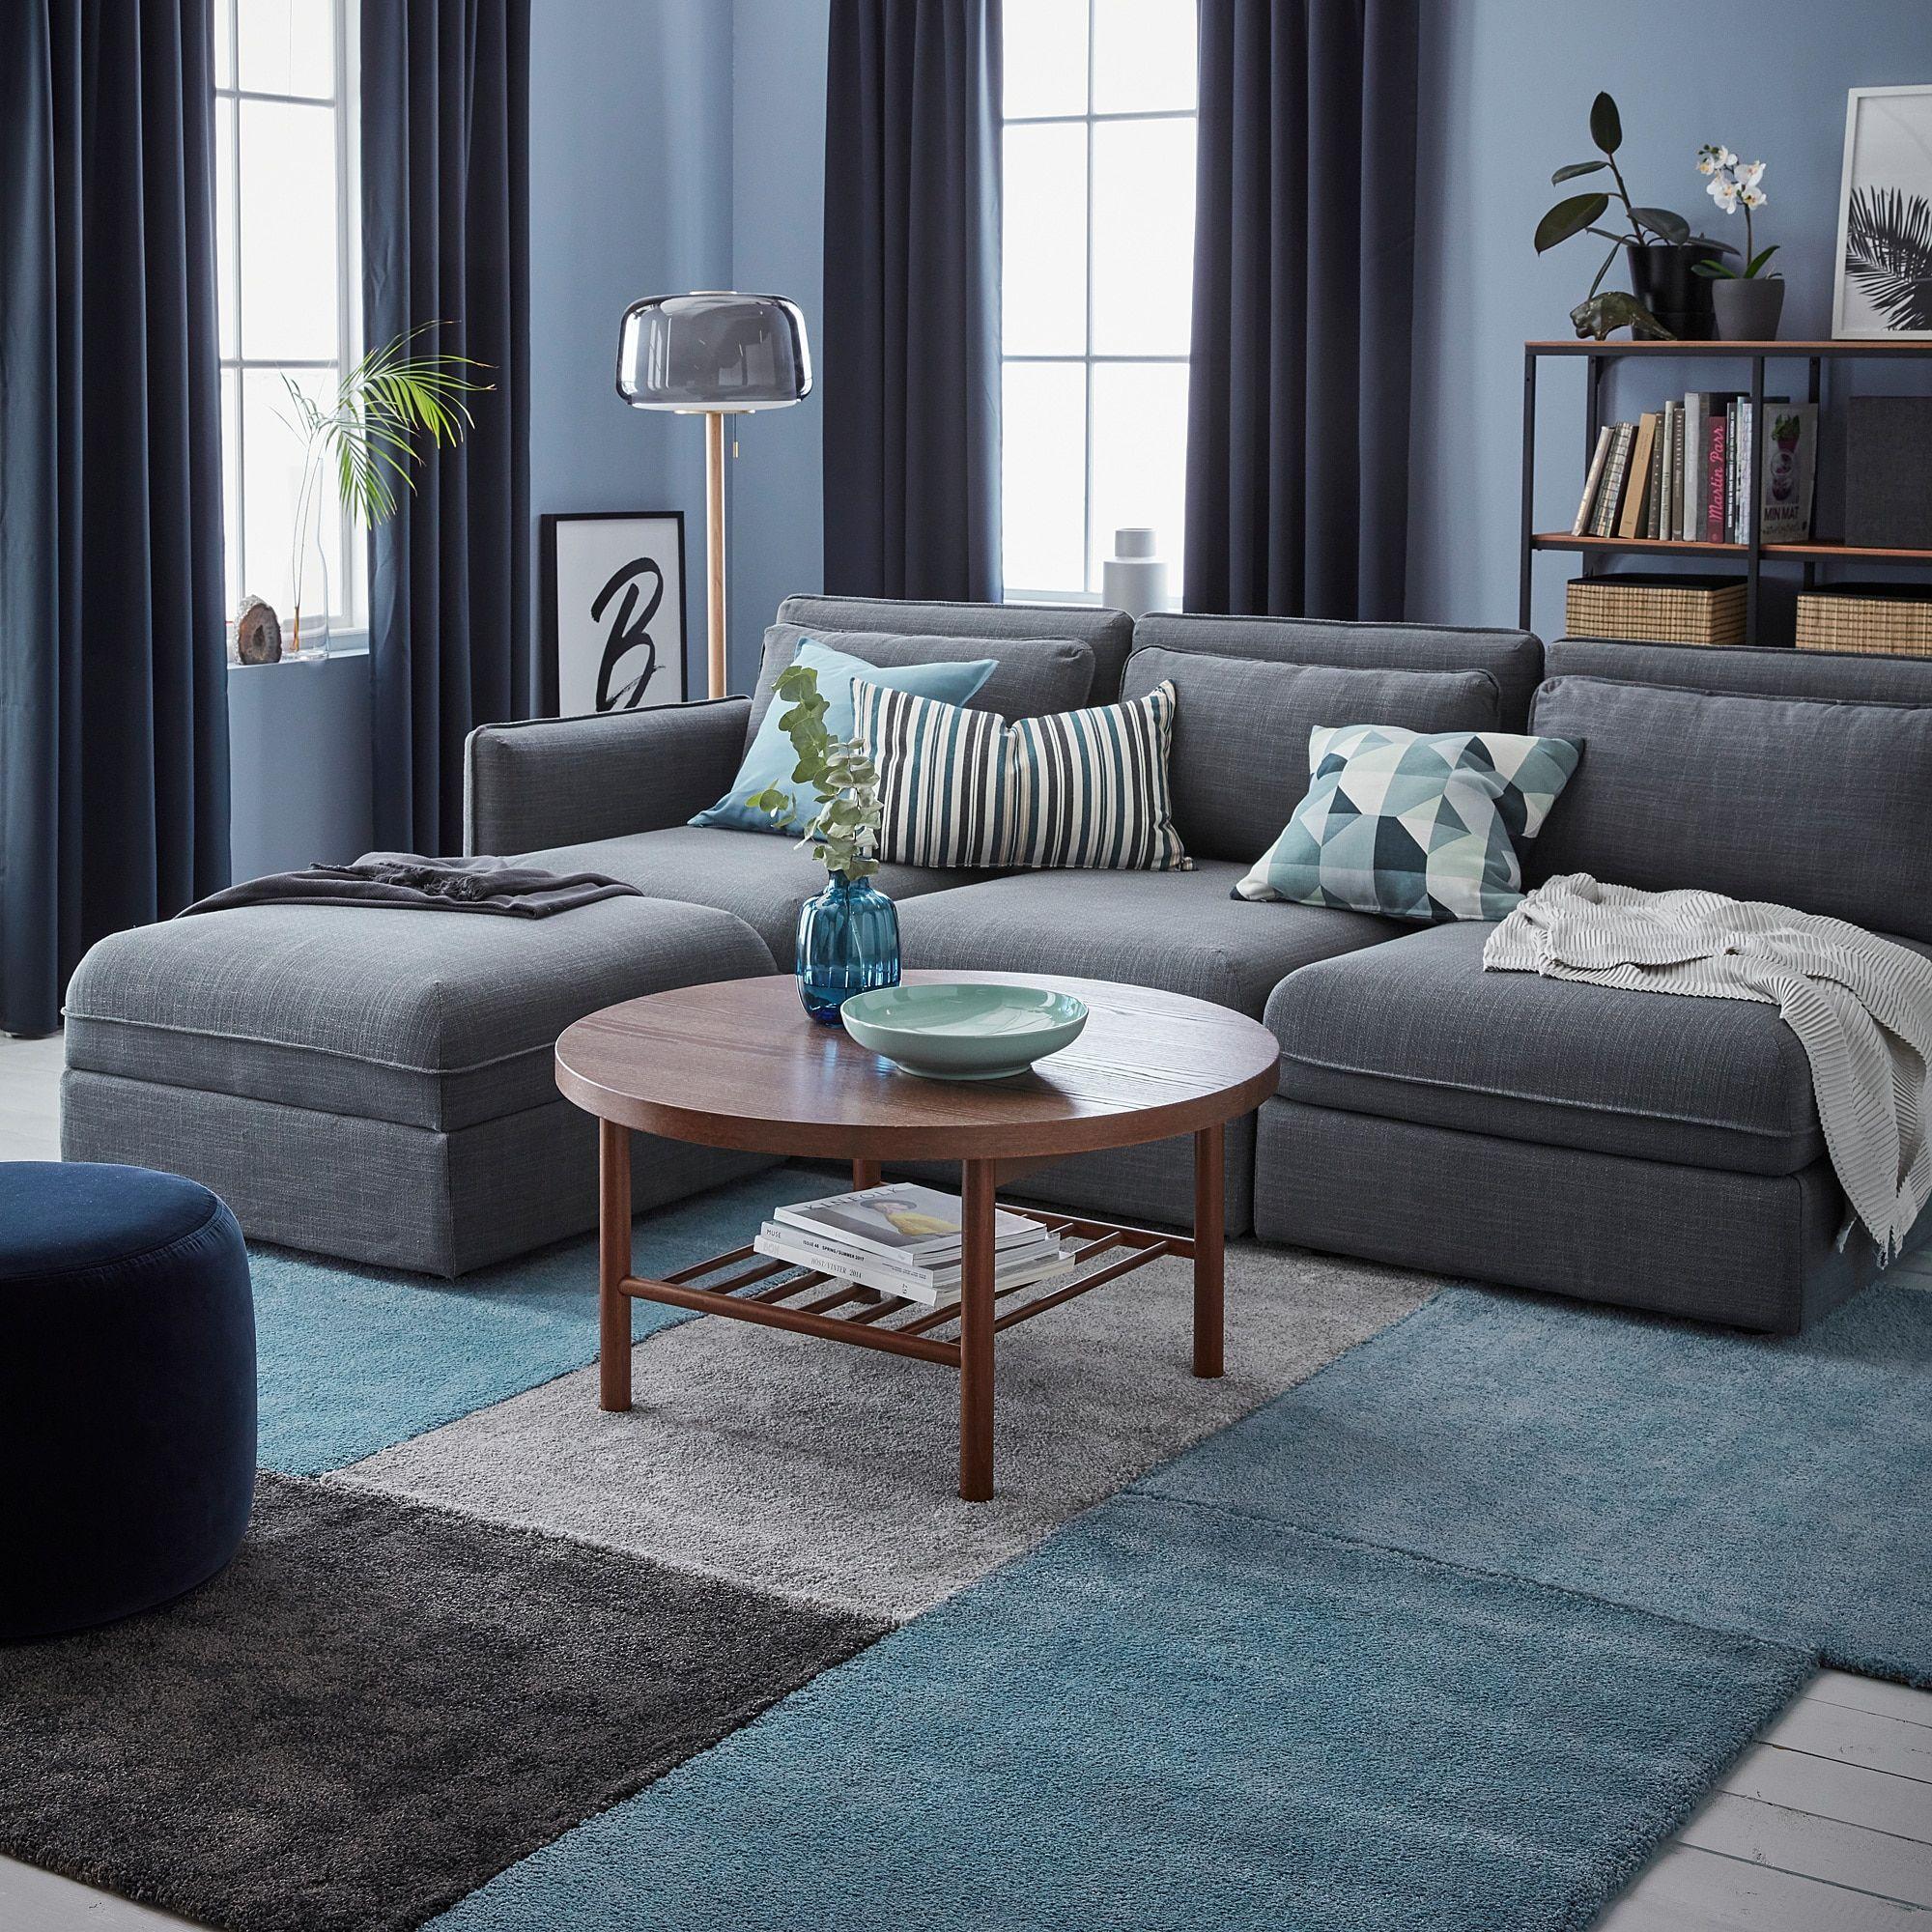 IKEA STOENSE Medium Gray Rug, low pile in 2019